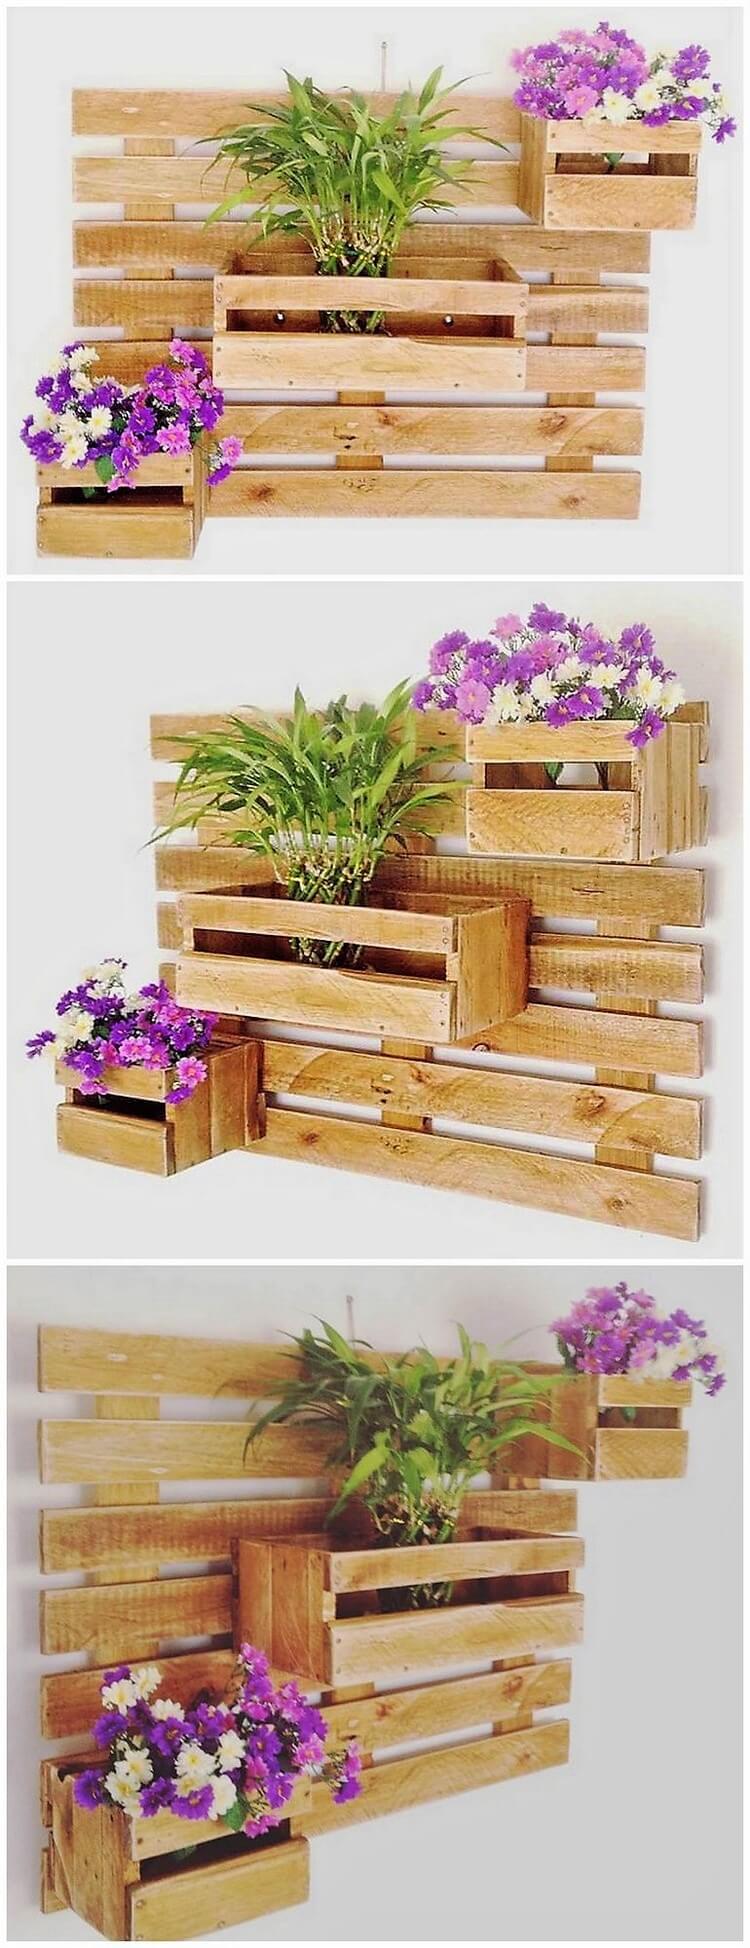 Pallet Wall Decor Planter